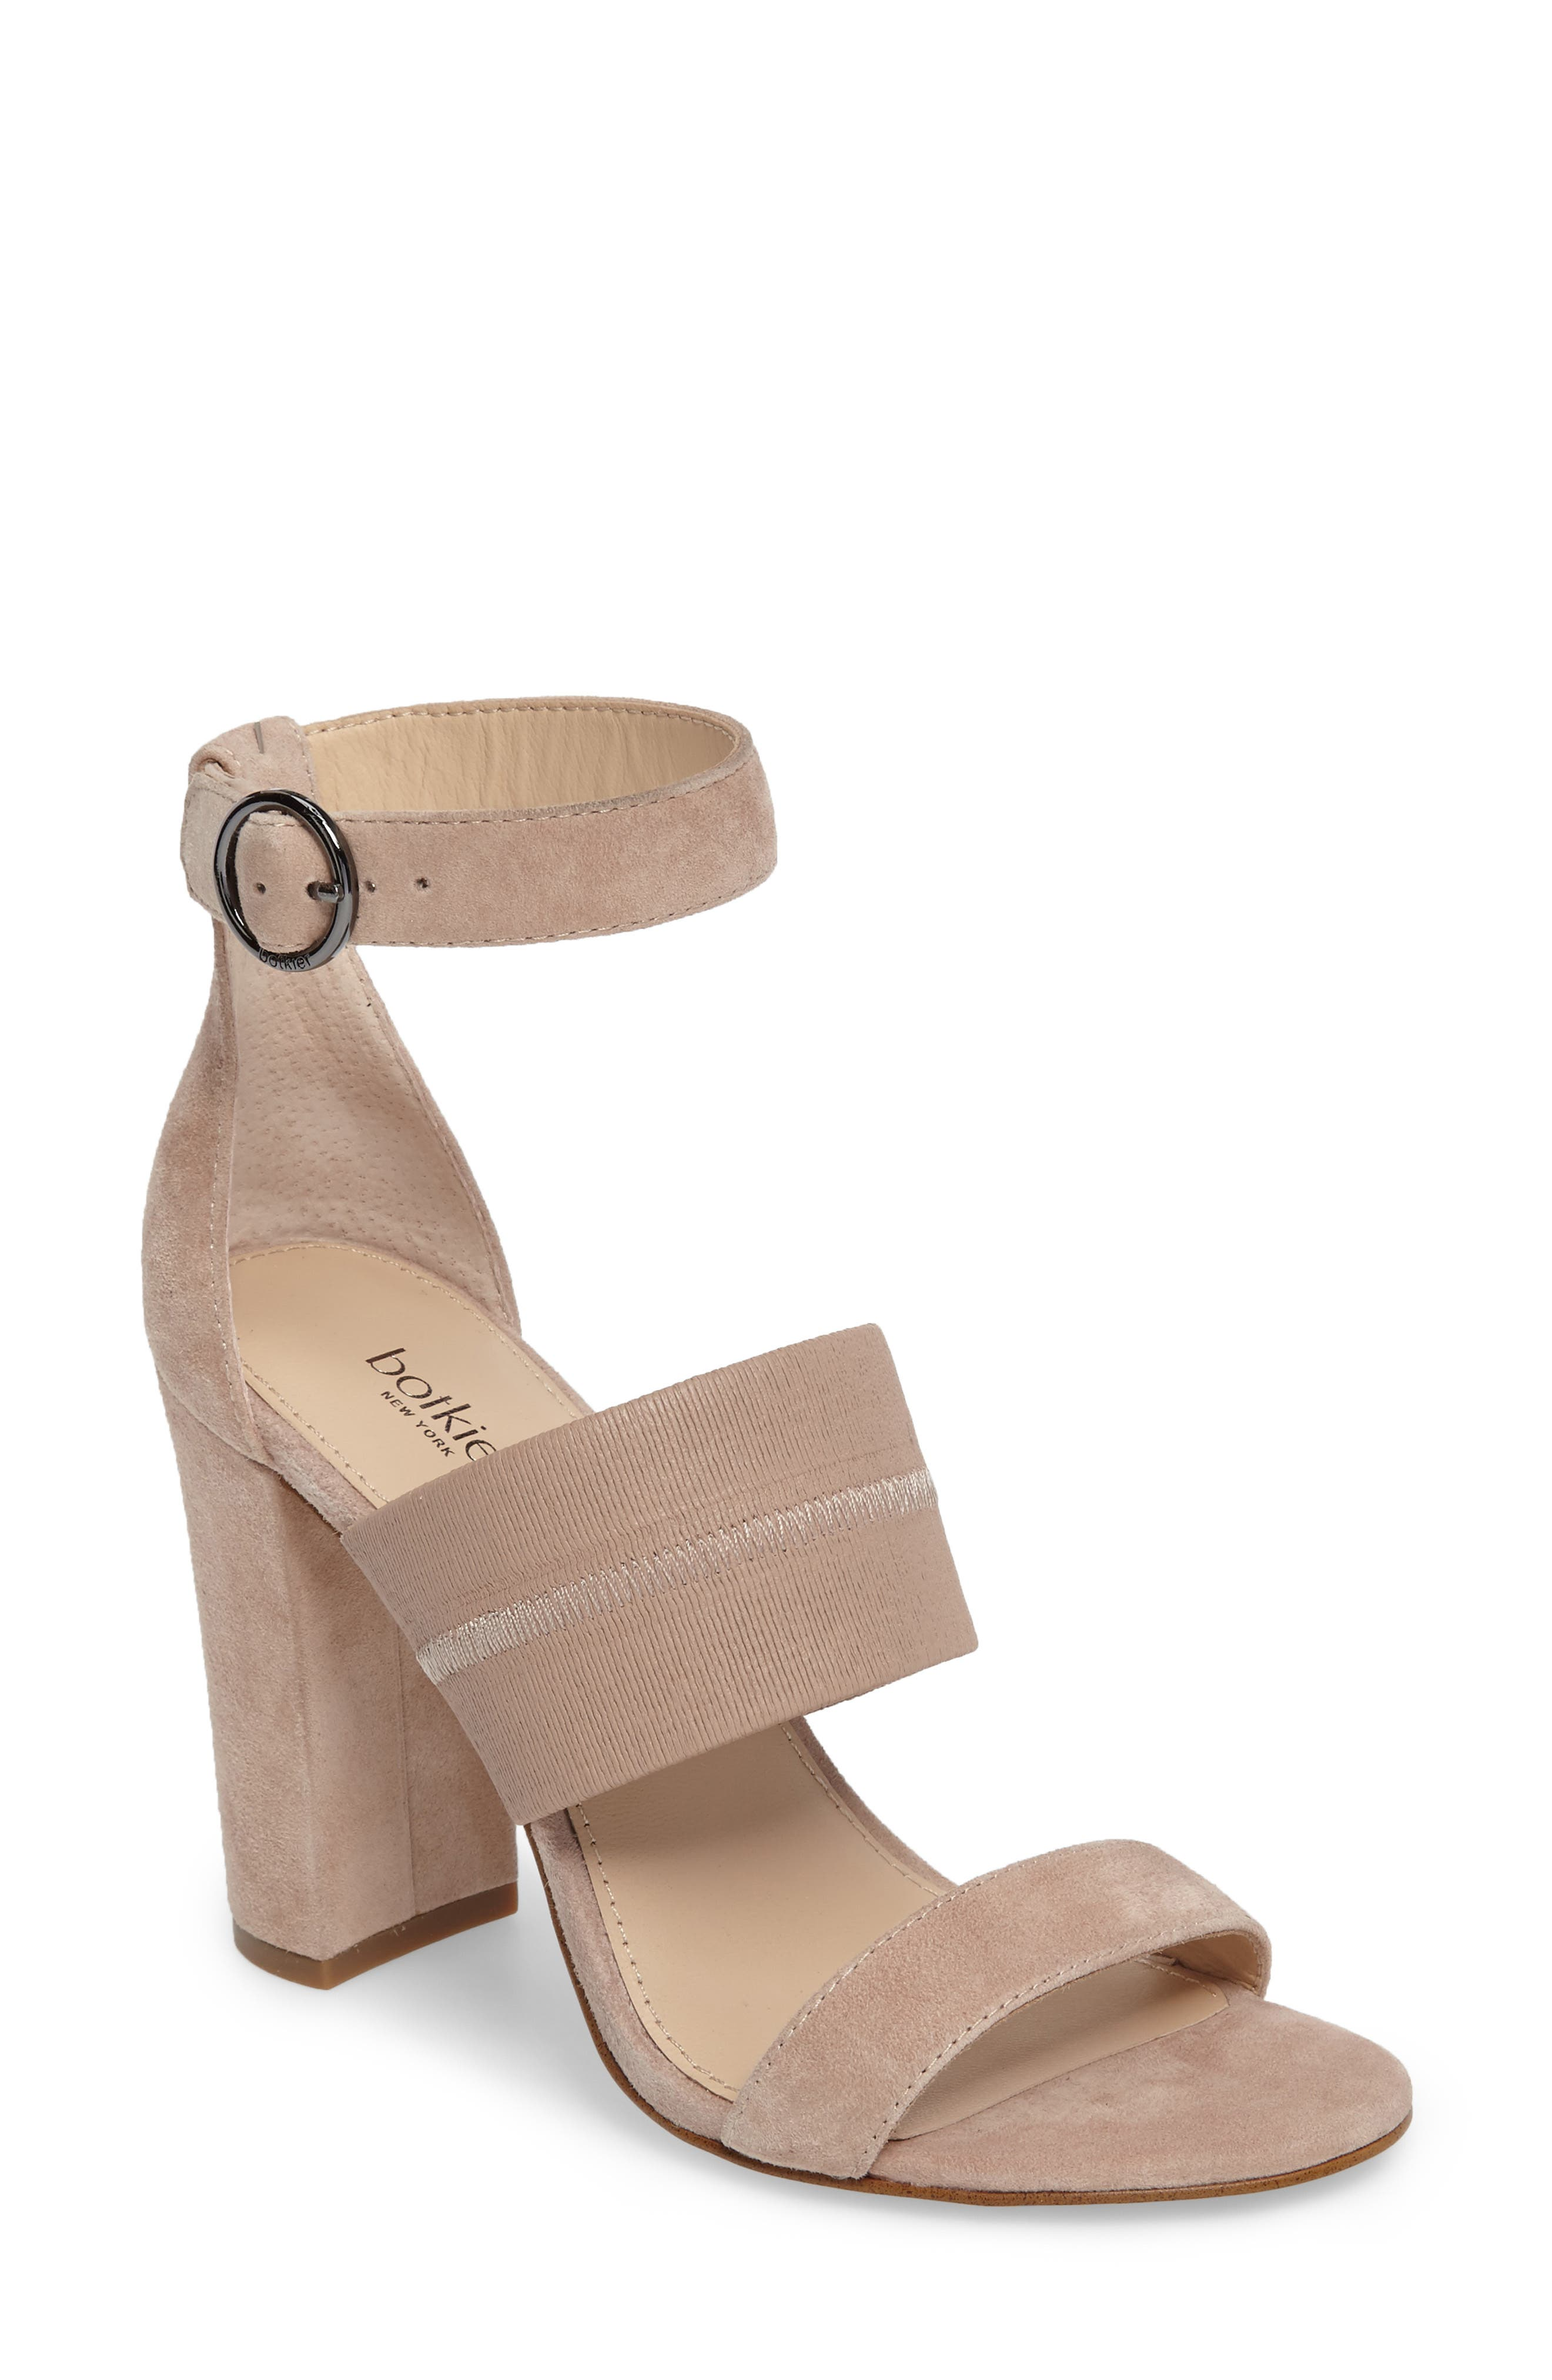 BOTKIER Gisella Ankle Strap Sandal